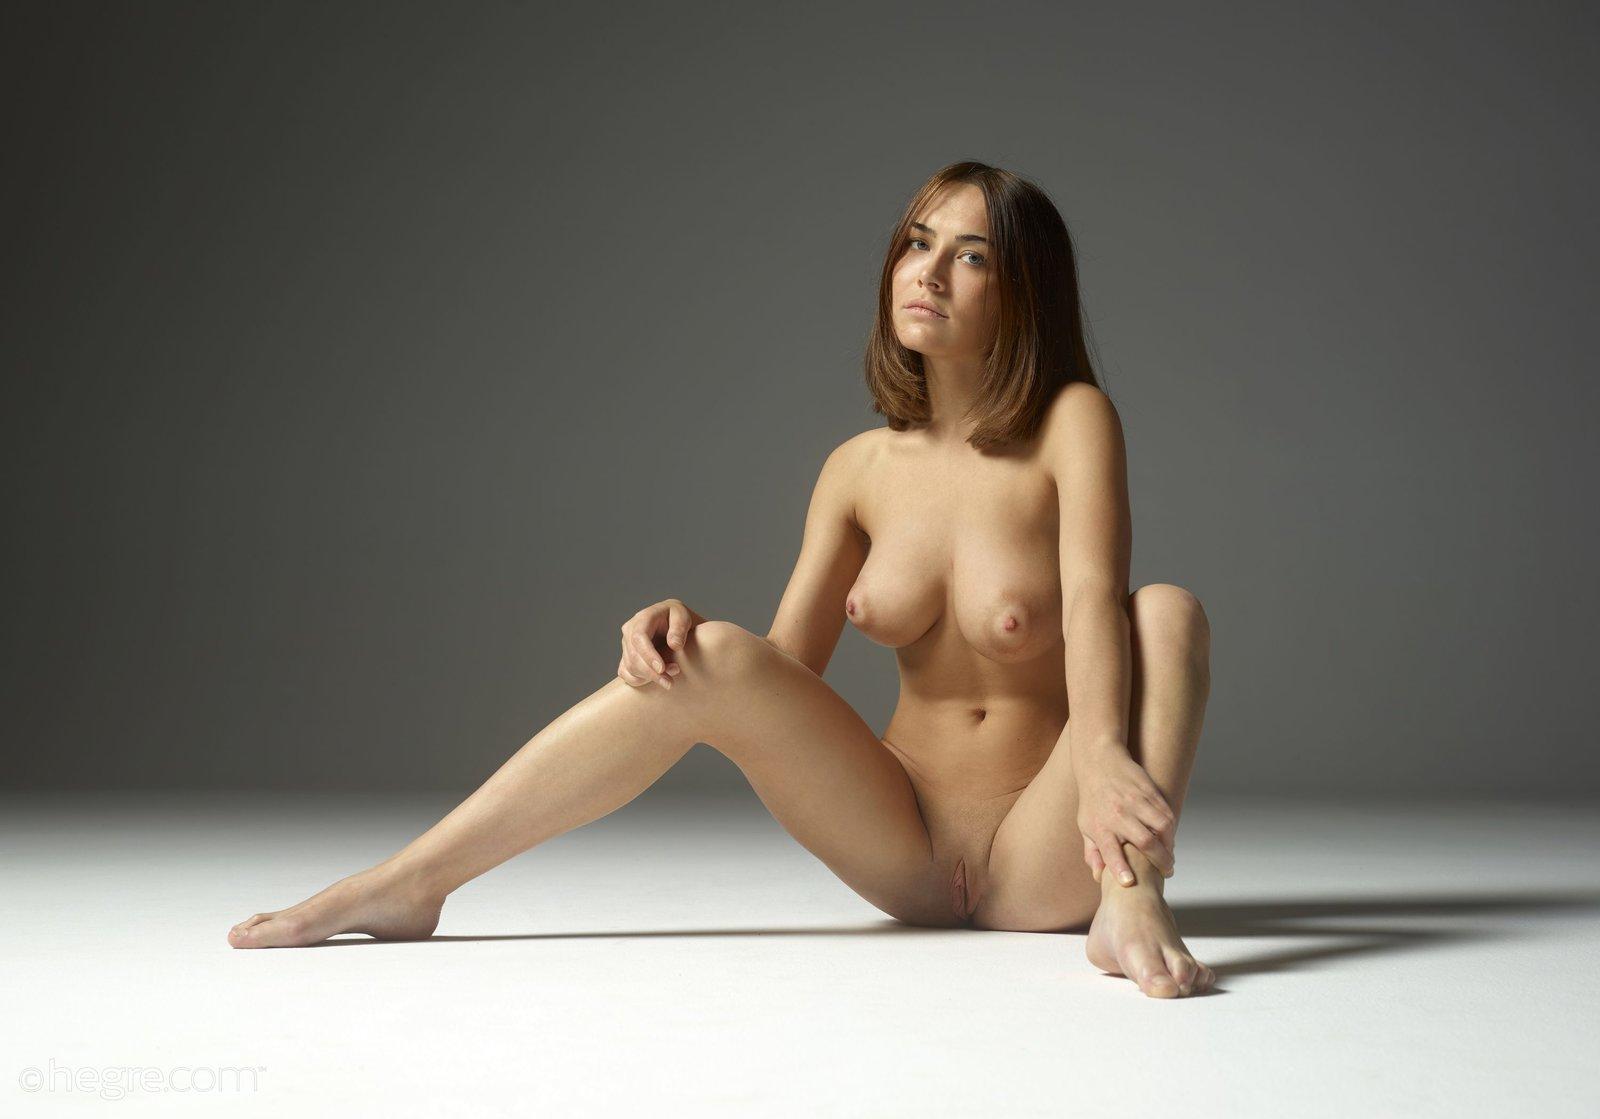 Pakistani porn models fully naked